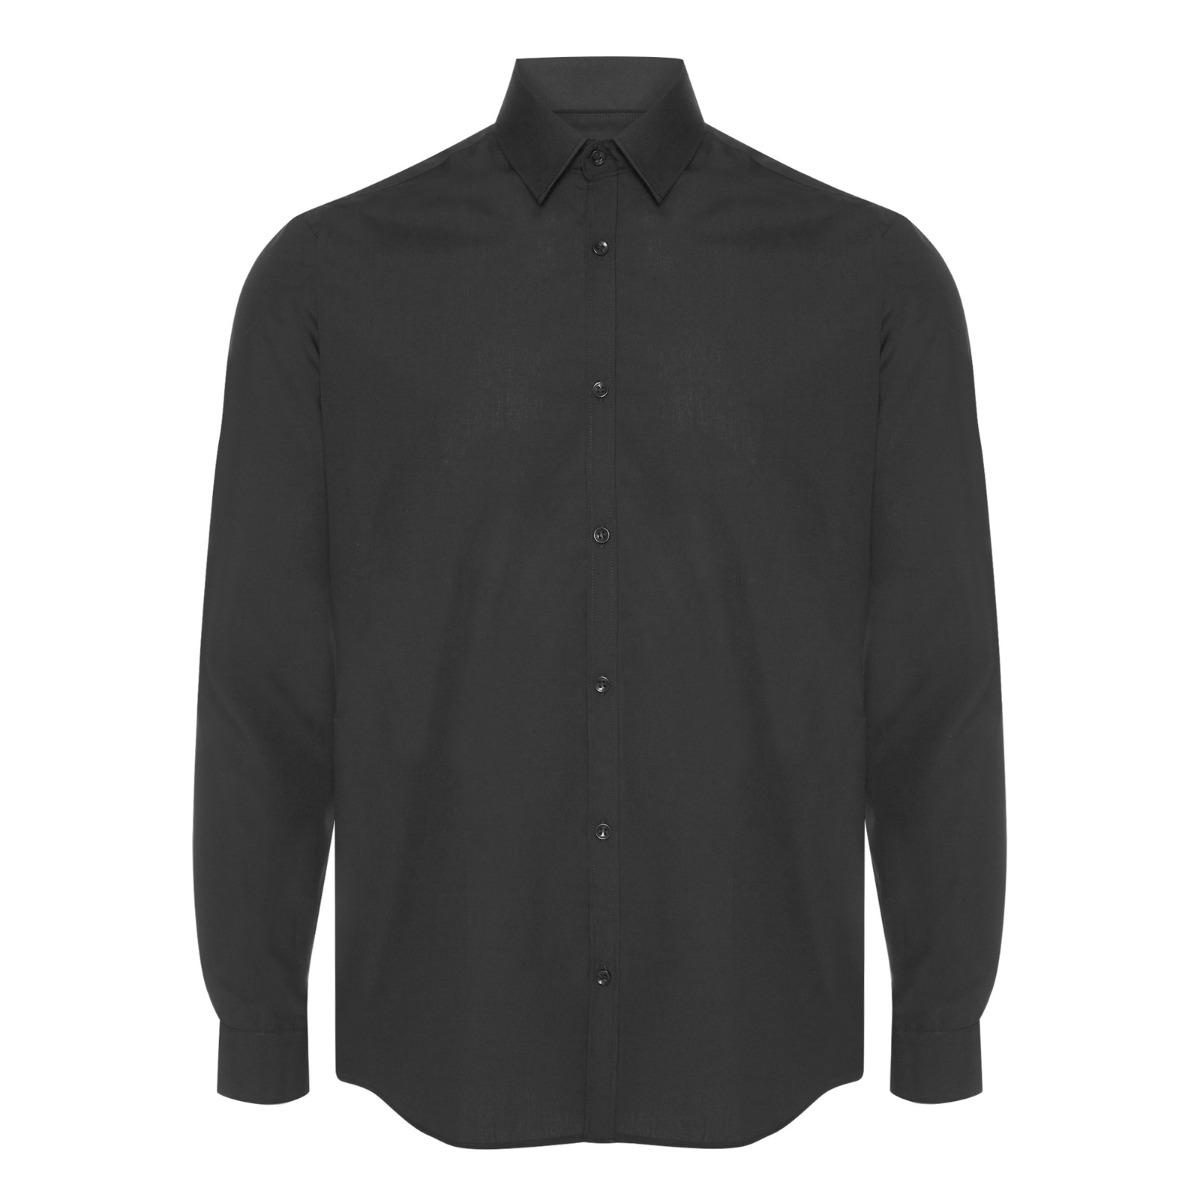 Mens-Black-Formal-Shirt-Long-Sleeve-Regular-Fit-Plain-Business-Work-Collar-Smart thumbnail 6